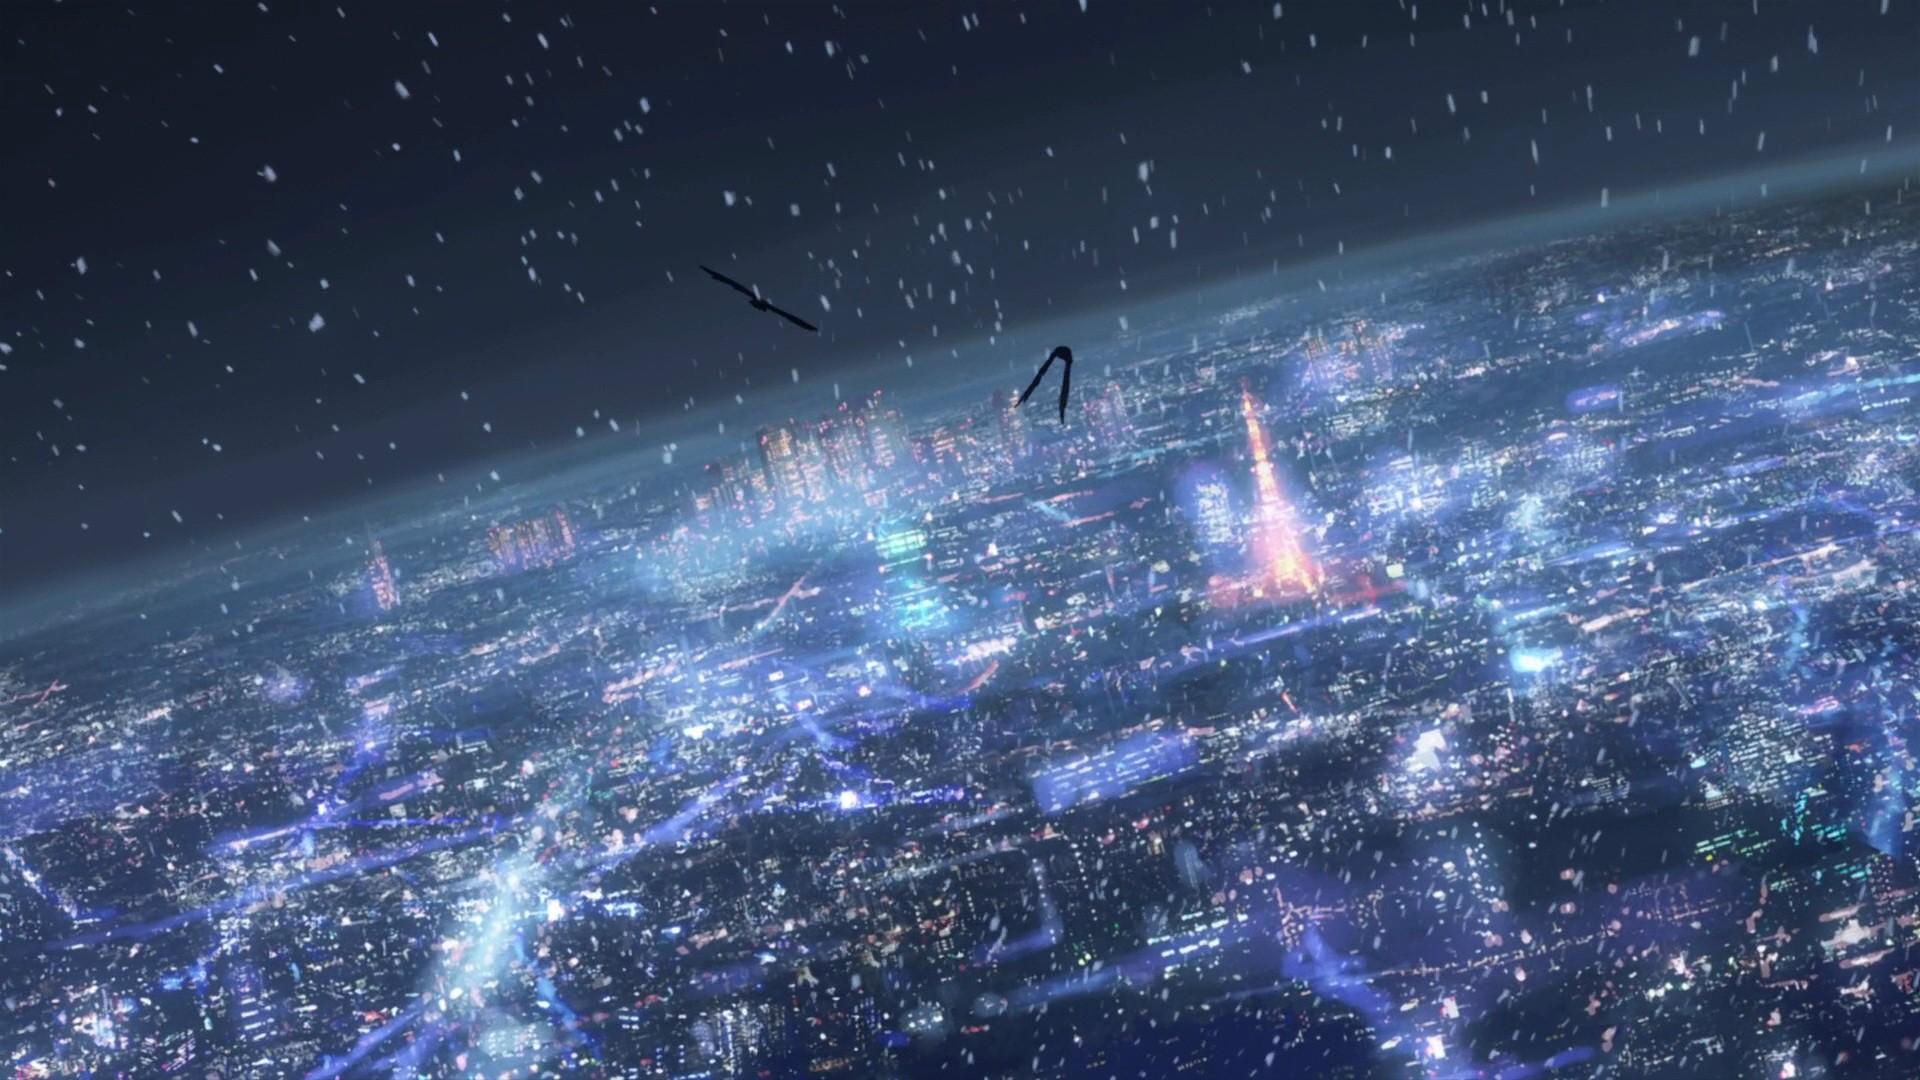 more discrete anime wallpapers! - Album on Imgur